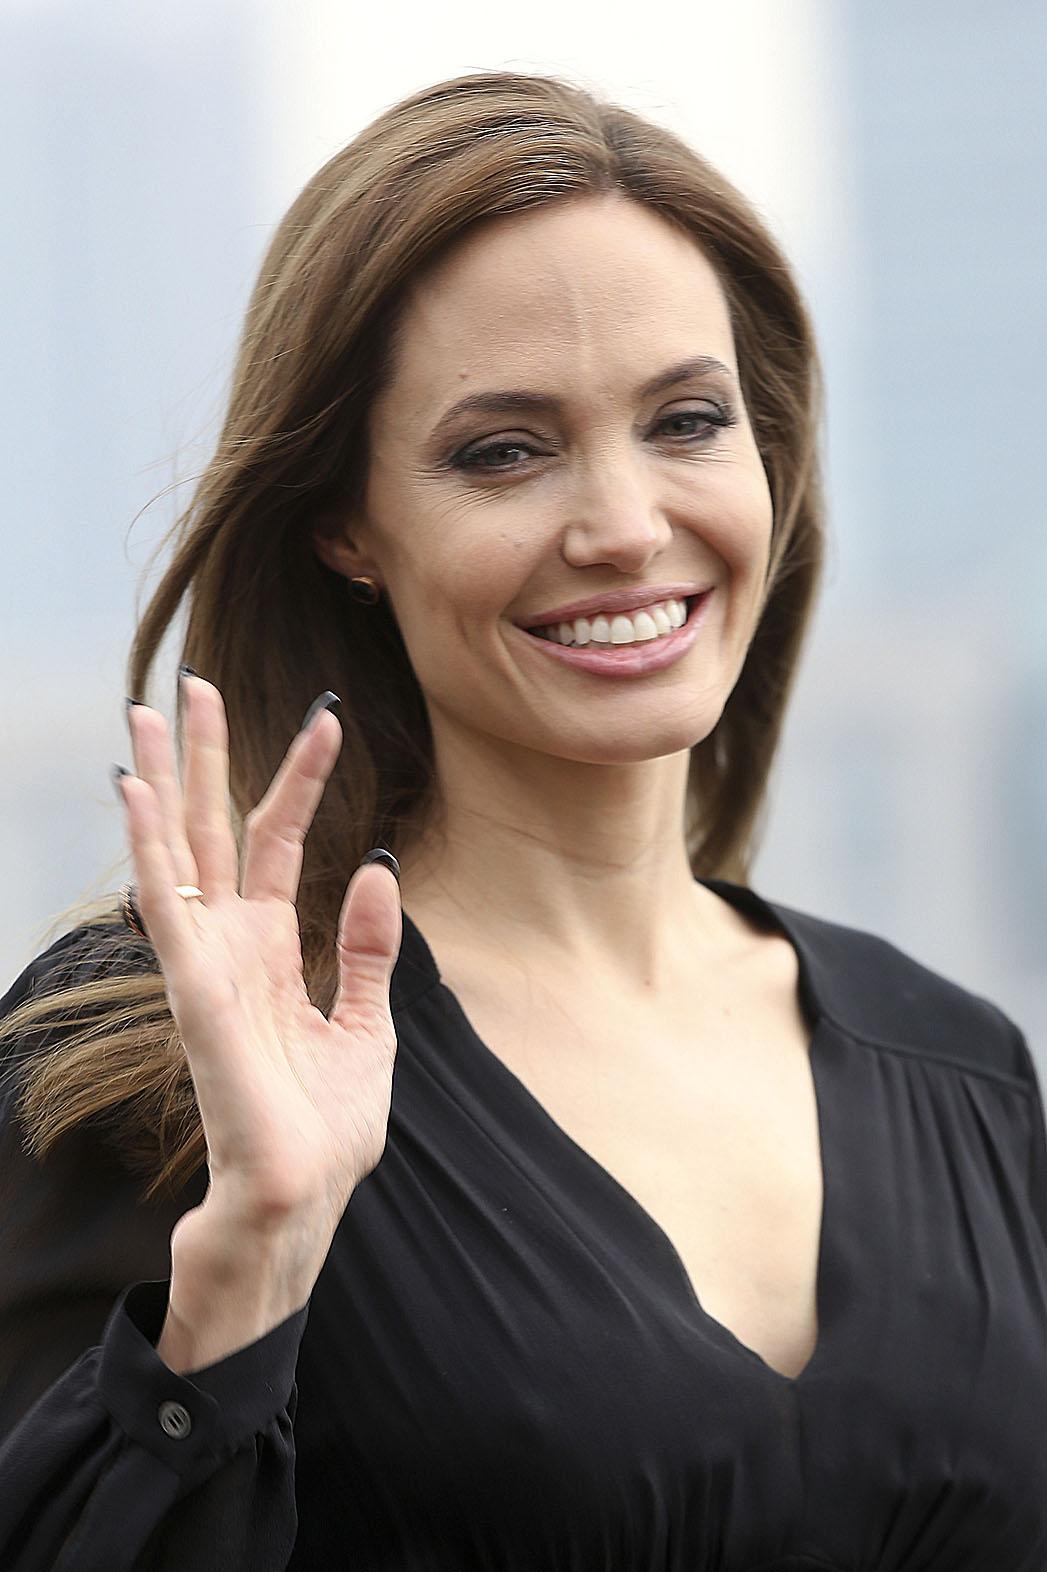 Angelina Jolie Headshot Shanghai - P 2014